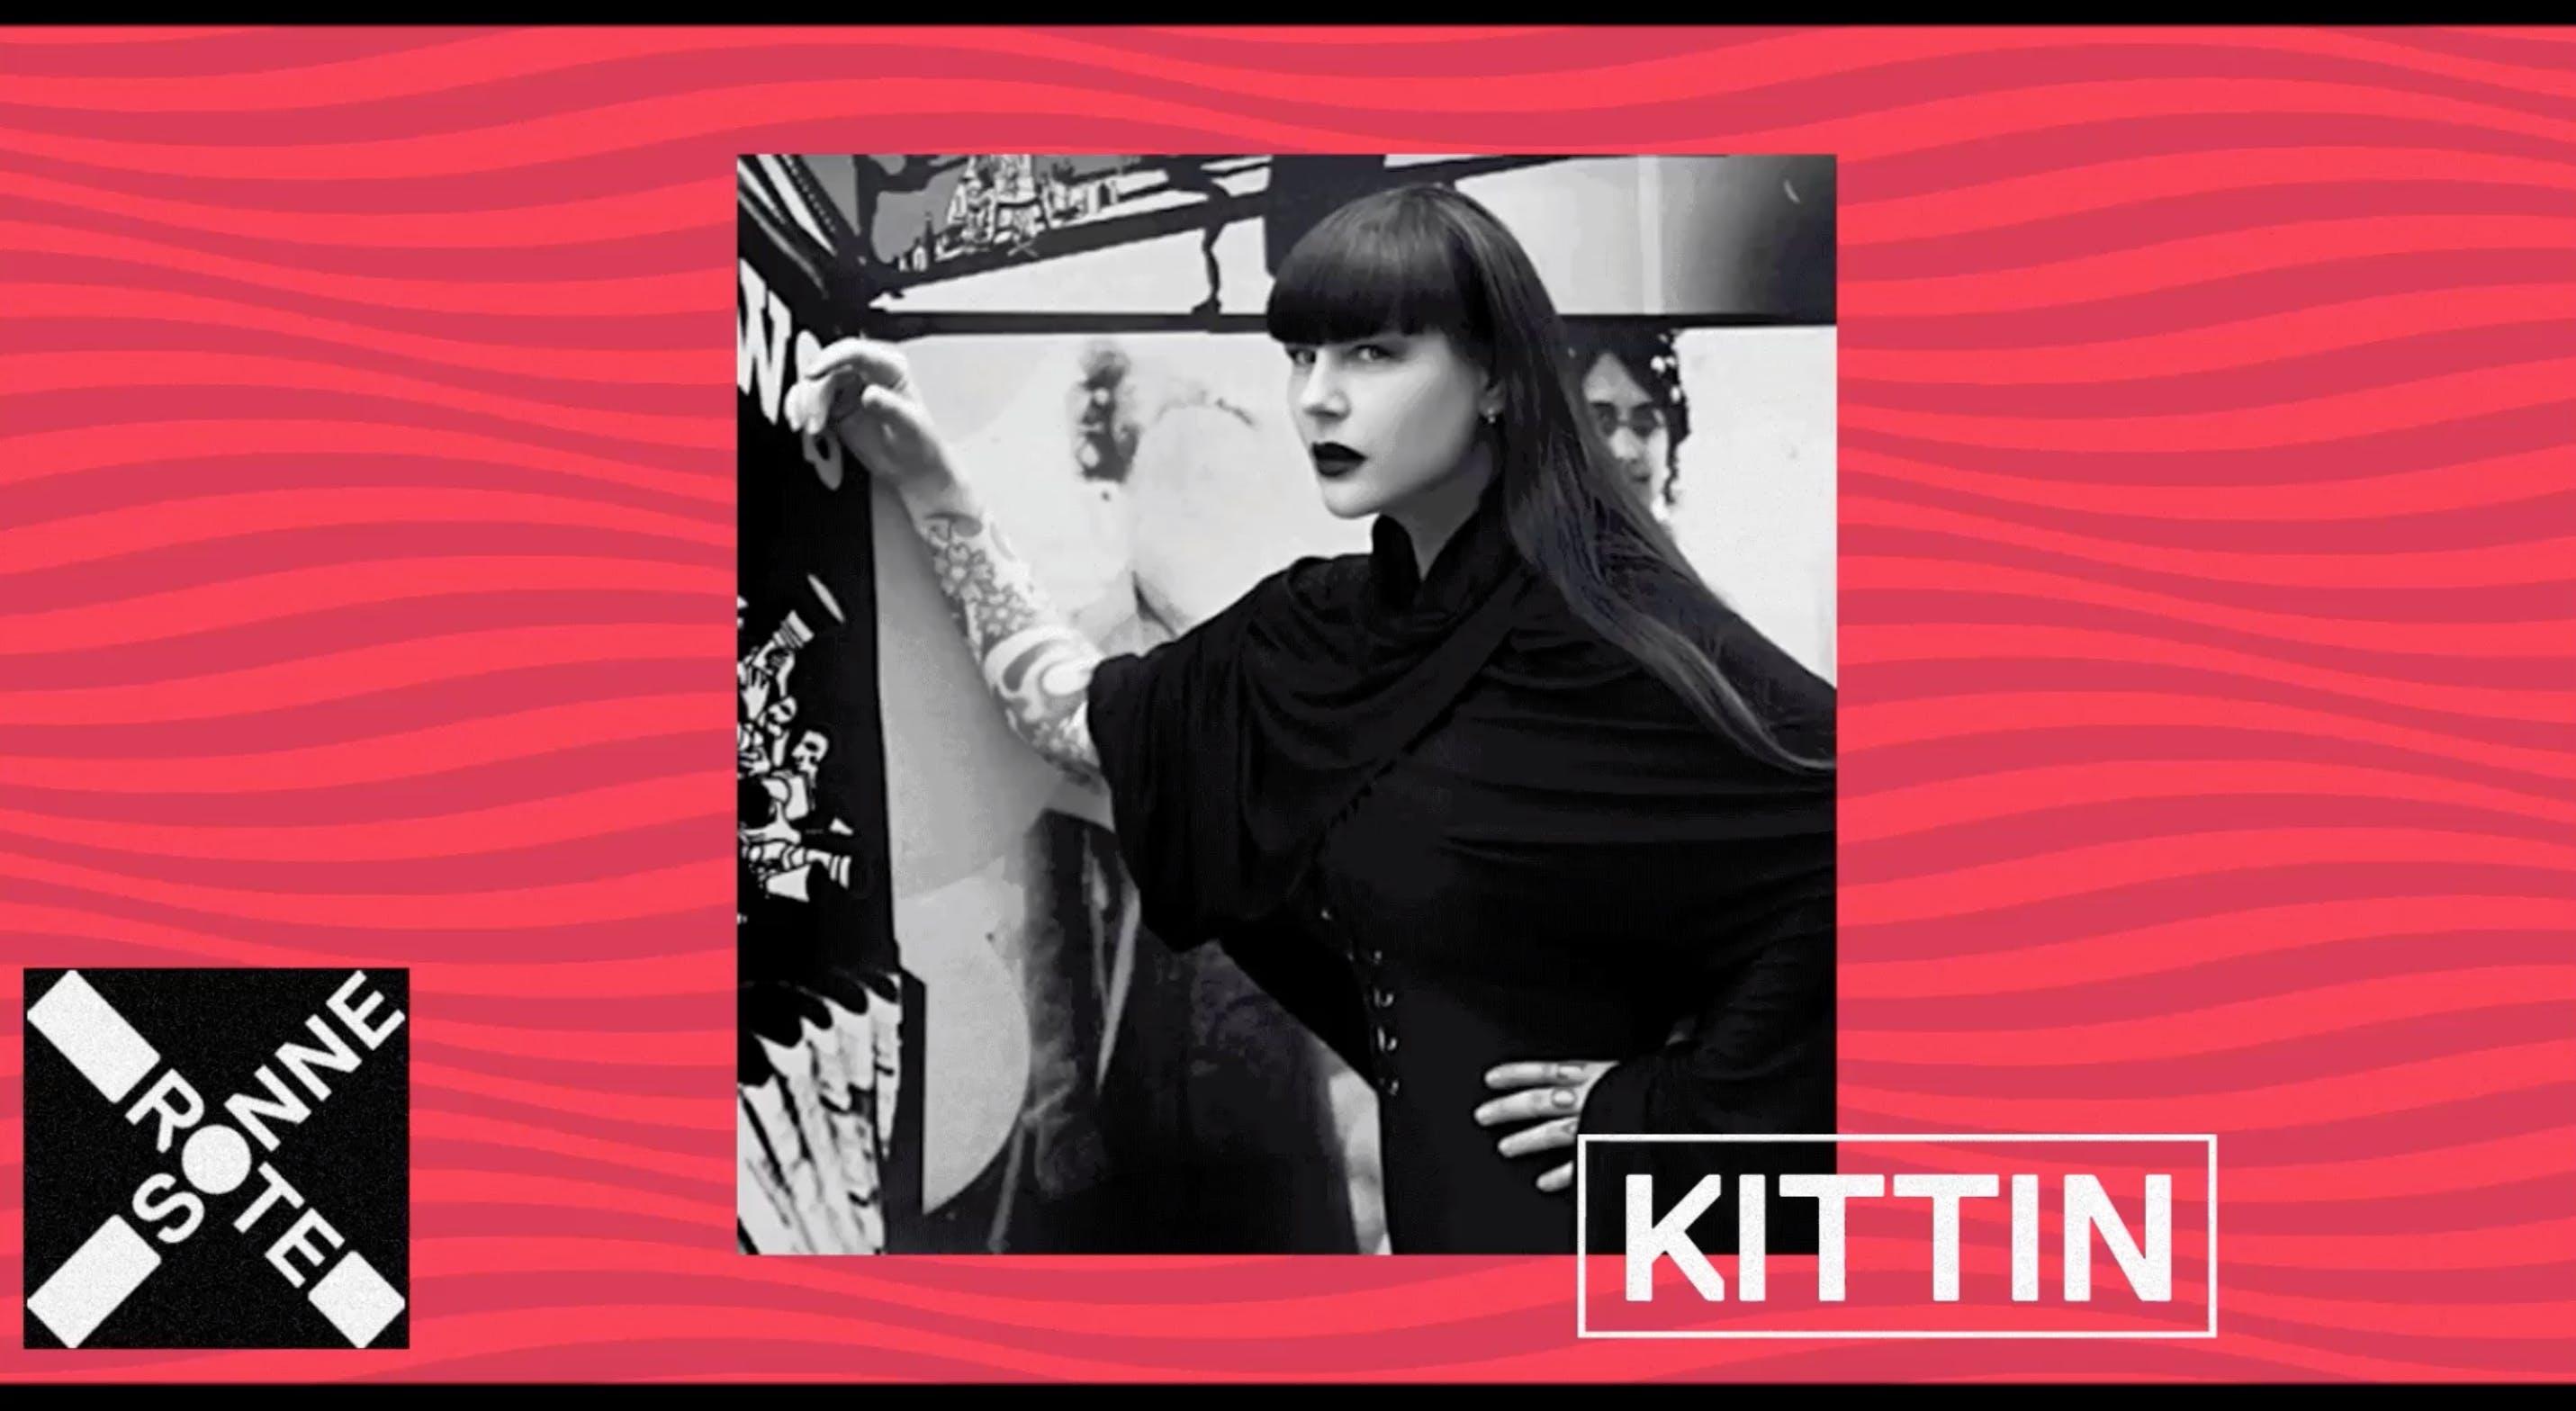 Kittin | at Rote Sonne